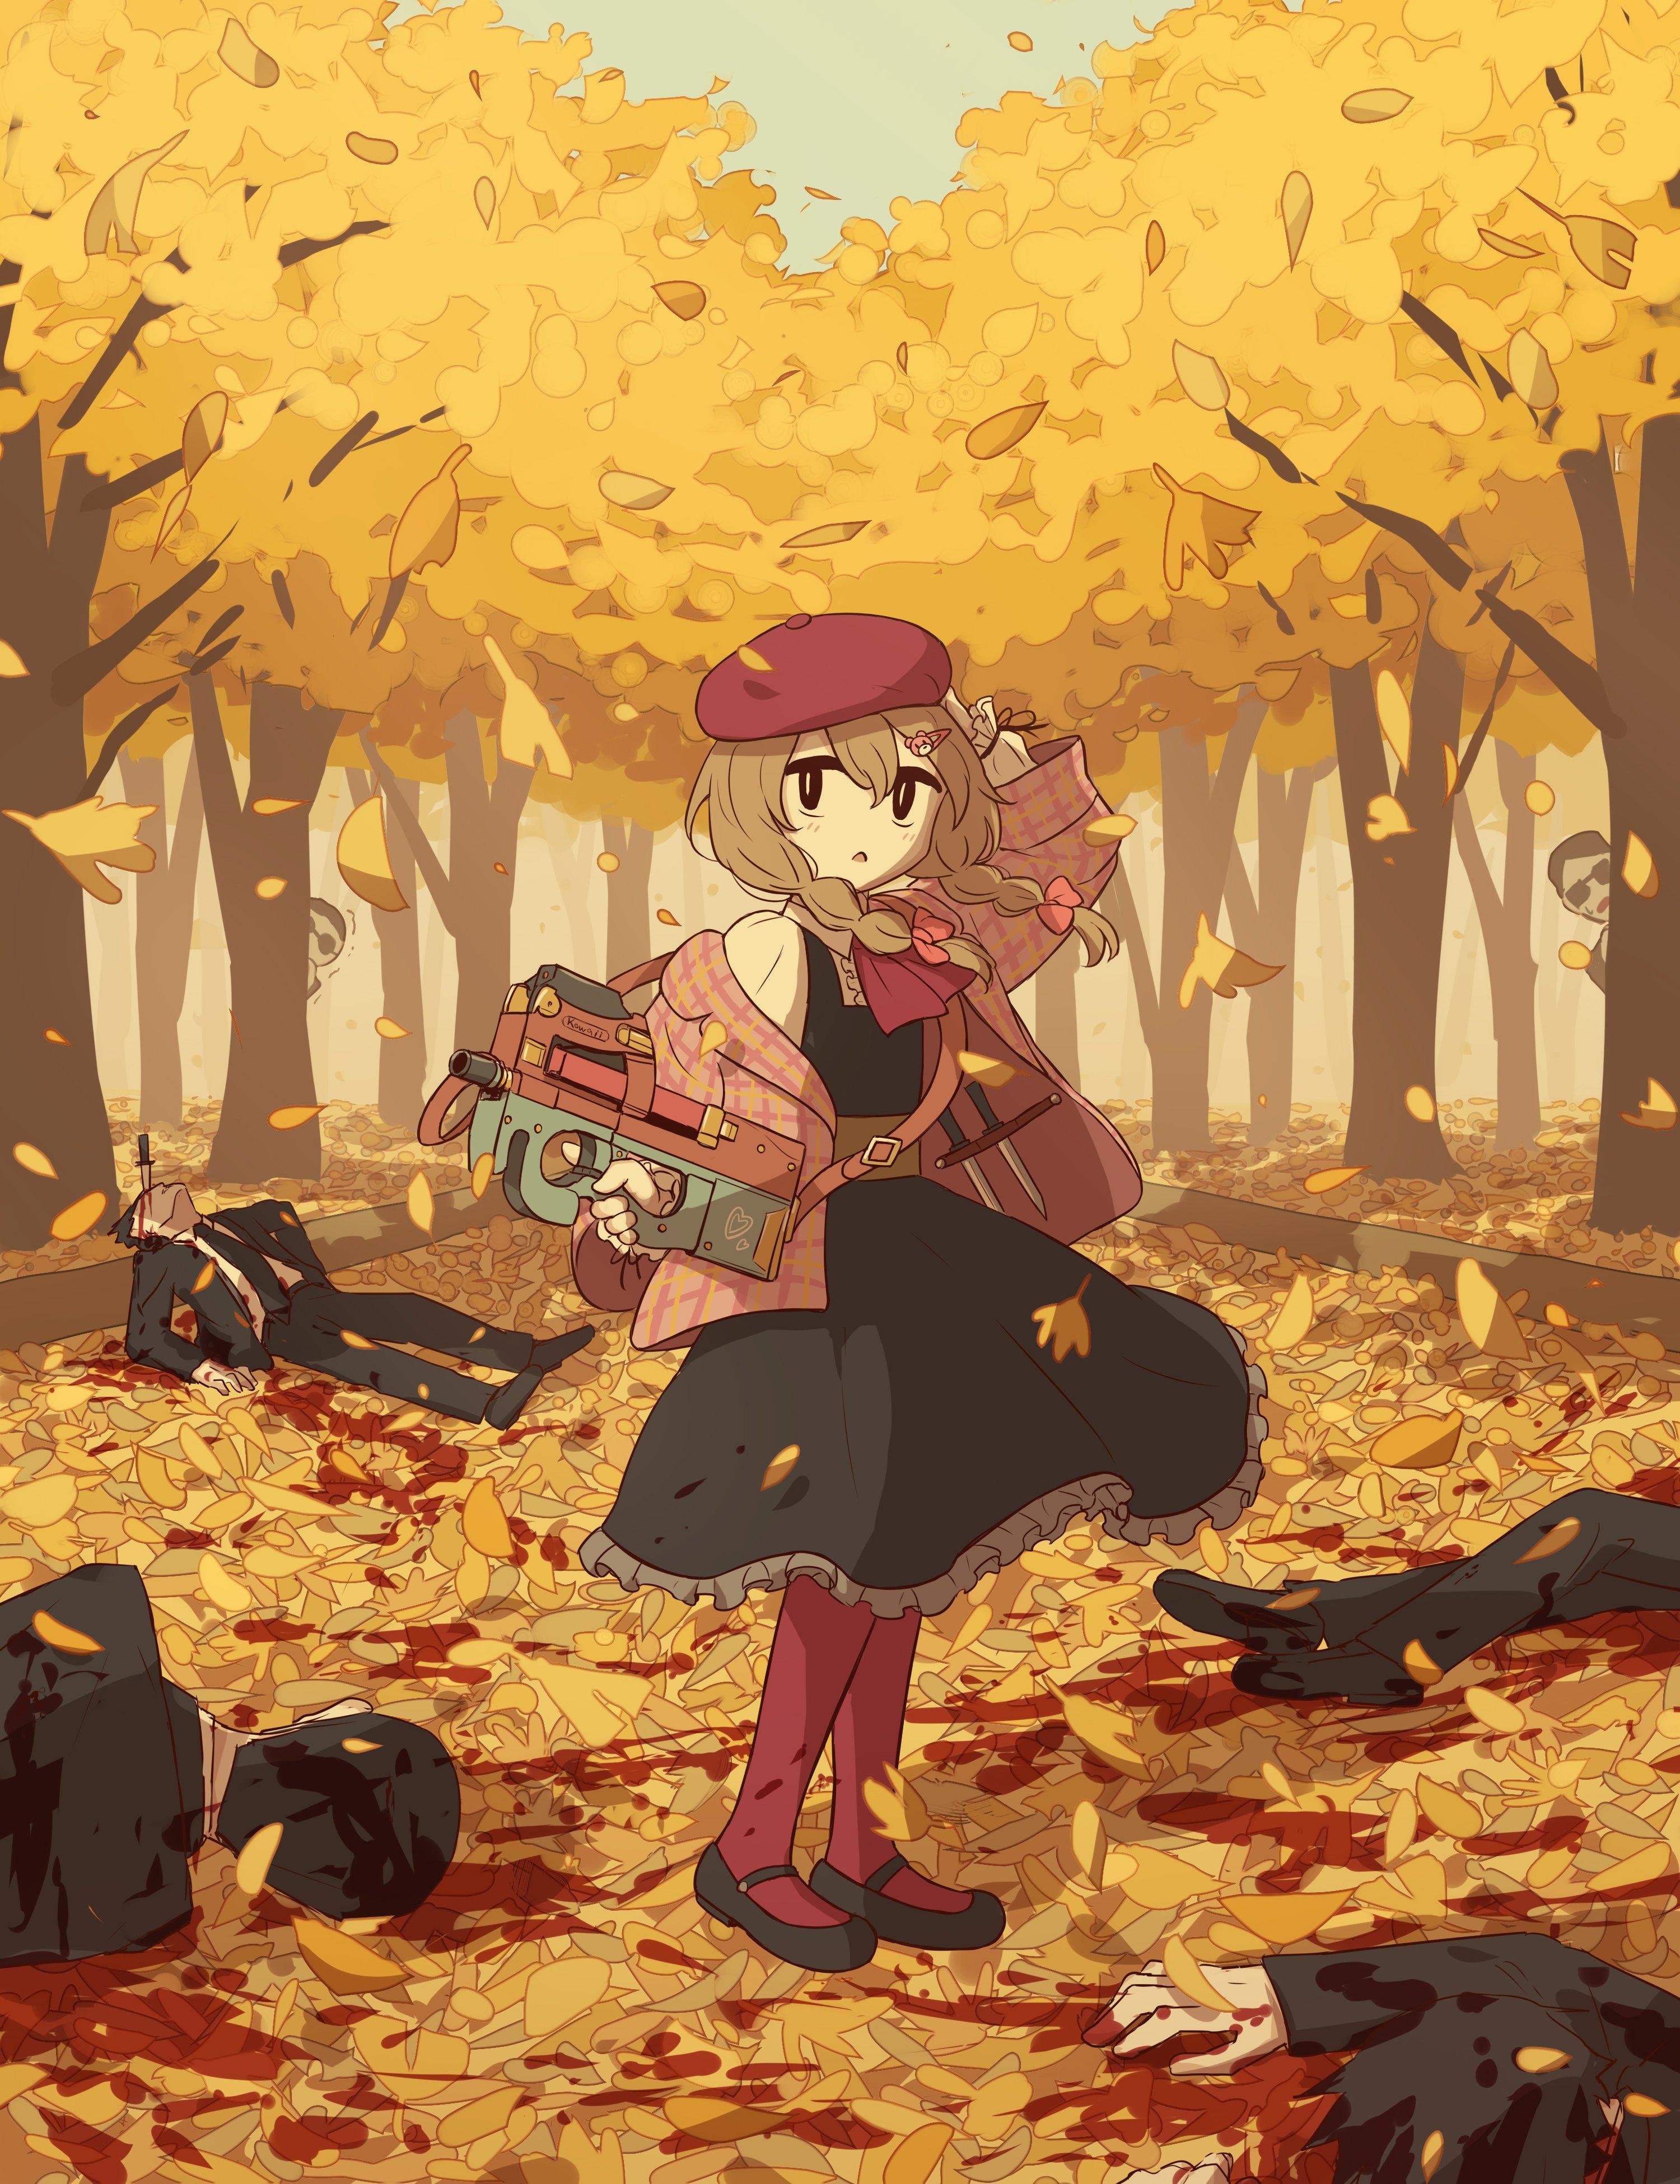 itotii-アボガド6 - kawaii autumn